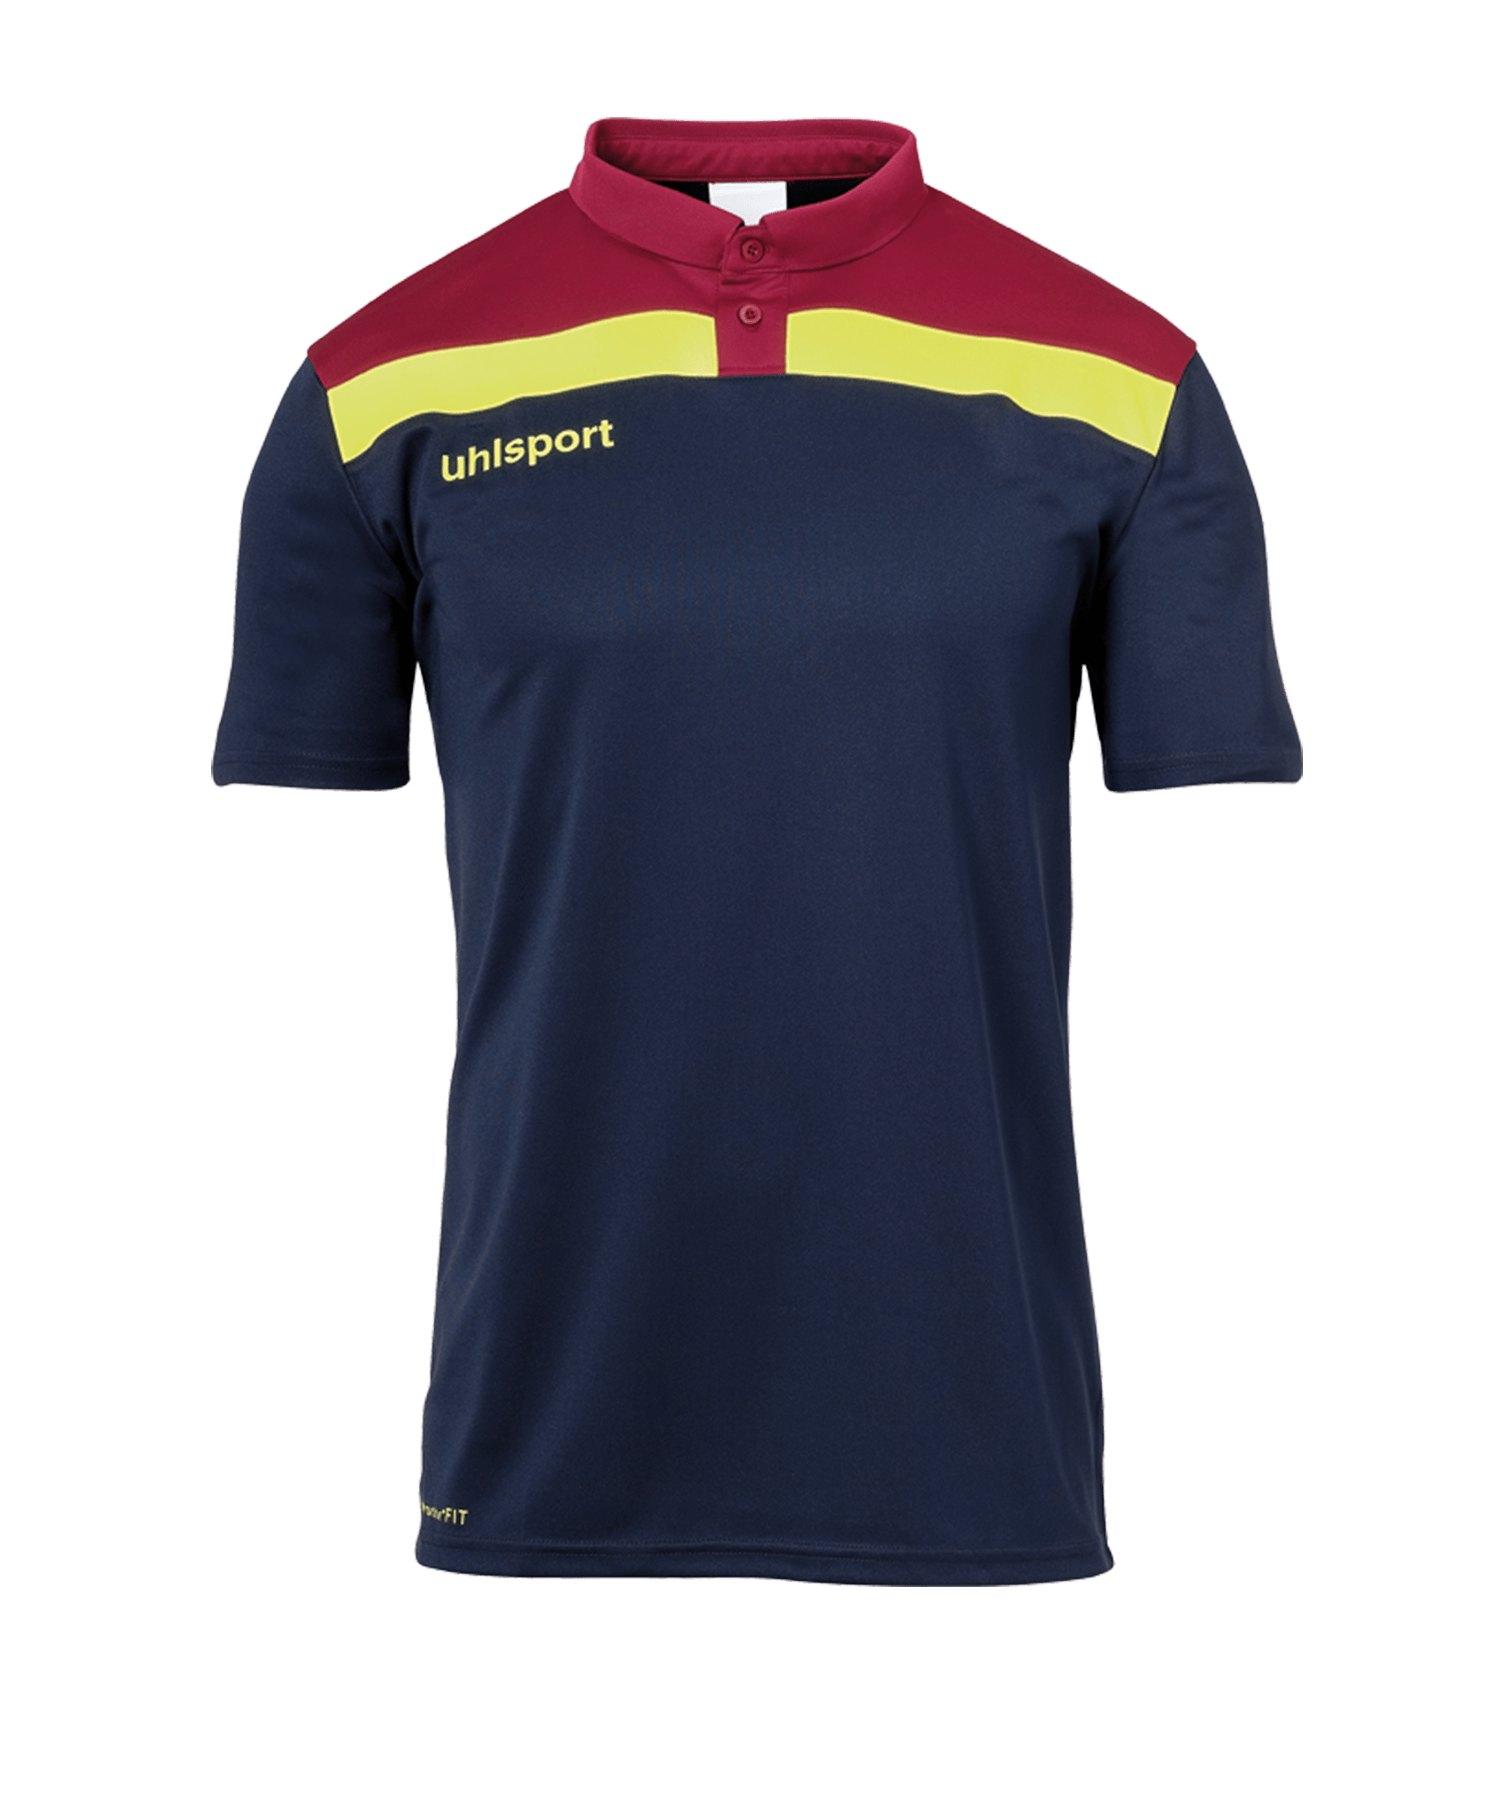 Uhlsport Offense 23 Poloshirt Kids Blau Rot F13 - blau